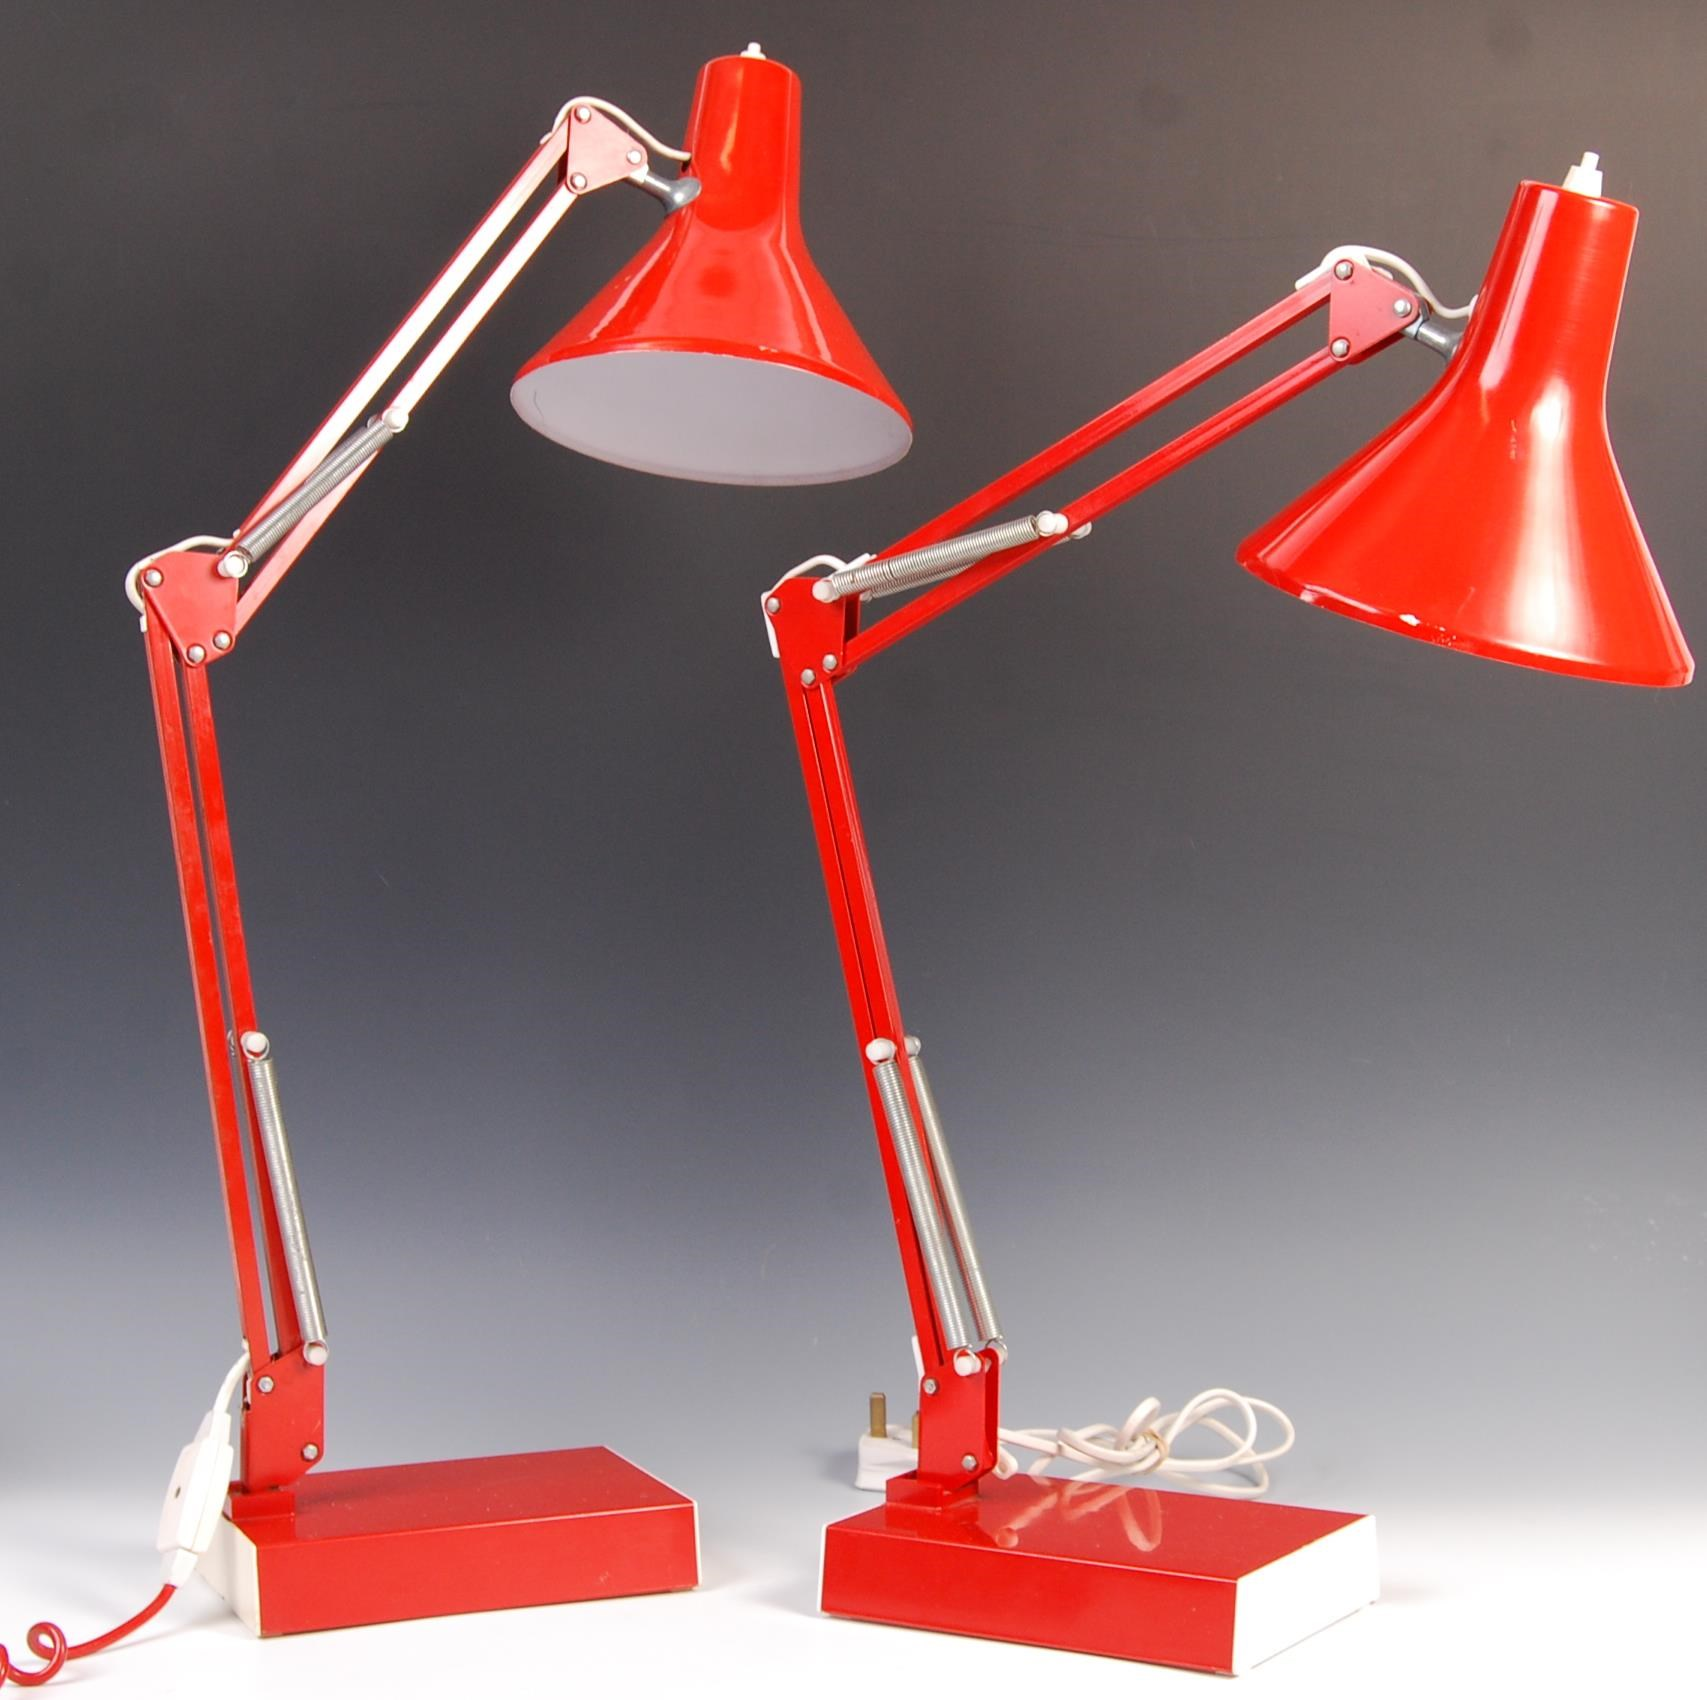 Lot 41 - SCANDINAVIAN RETRO VINTAGE ' ANGLEPOISE ' TYPE DESK LAMPS